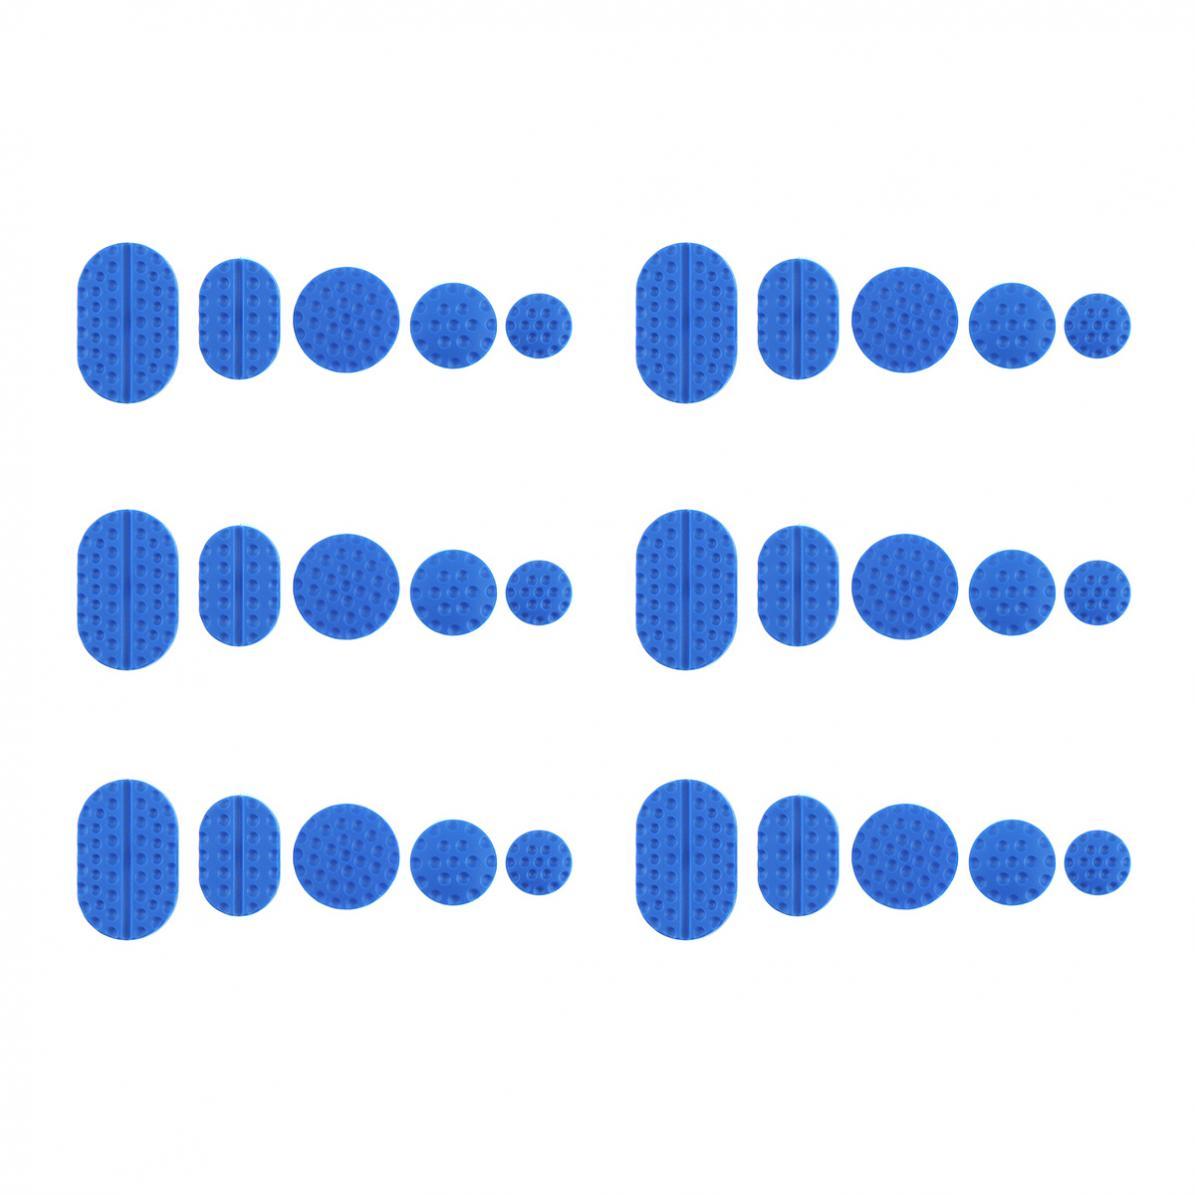 30pcs Universal  Blue PA  Car Body Dent Repair Shim Sucker Pull Cap Tabs Tools Accessory Kit  Suitable for Car